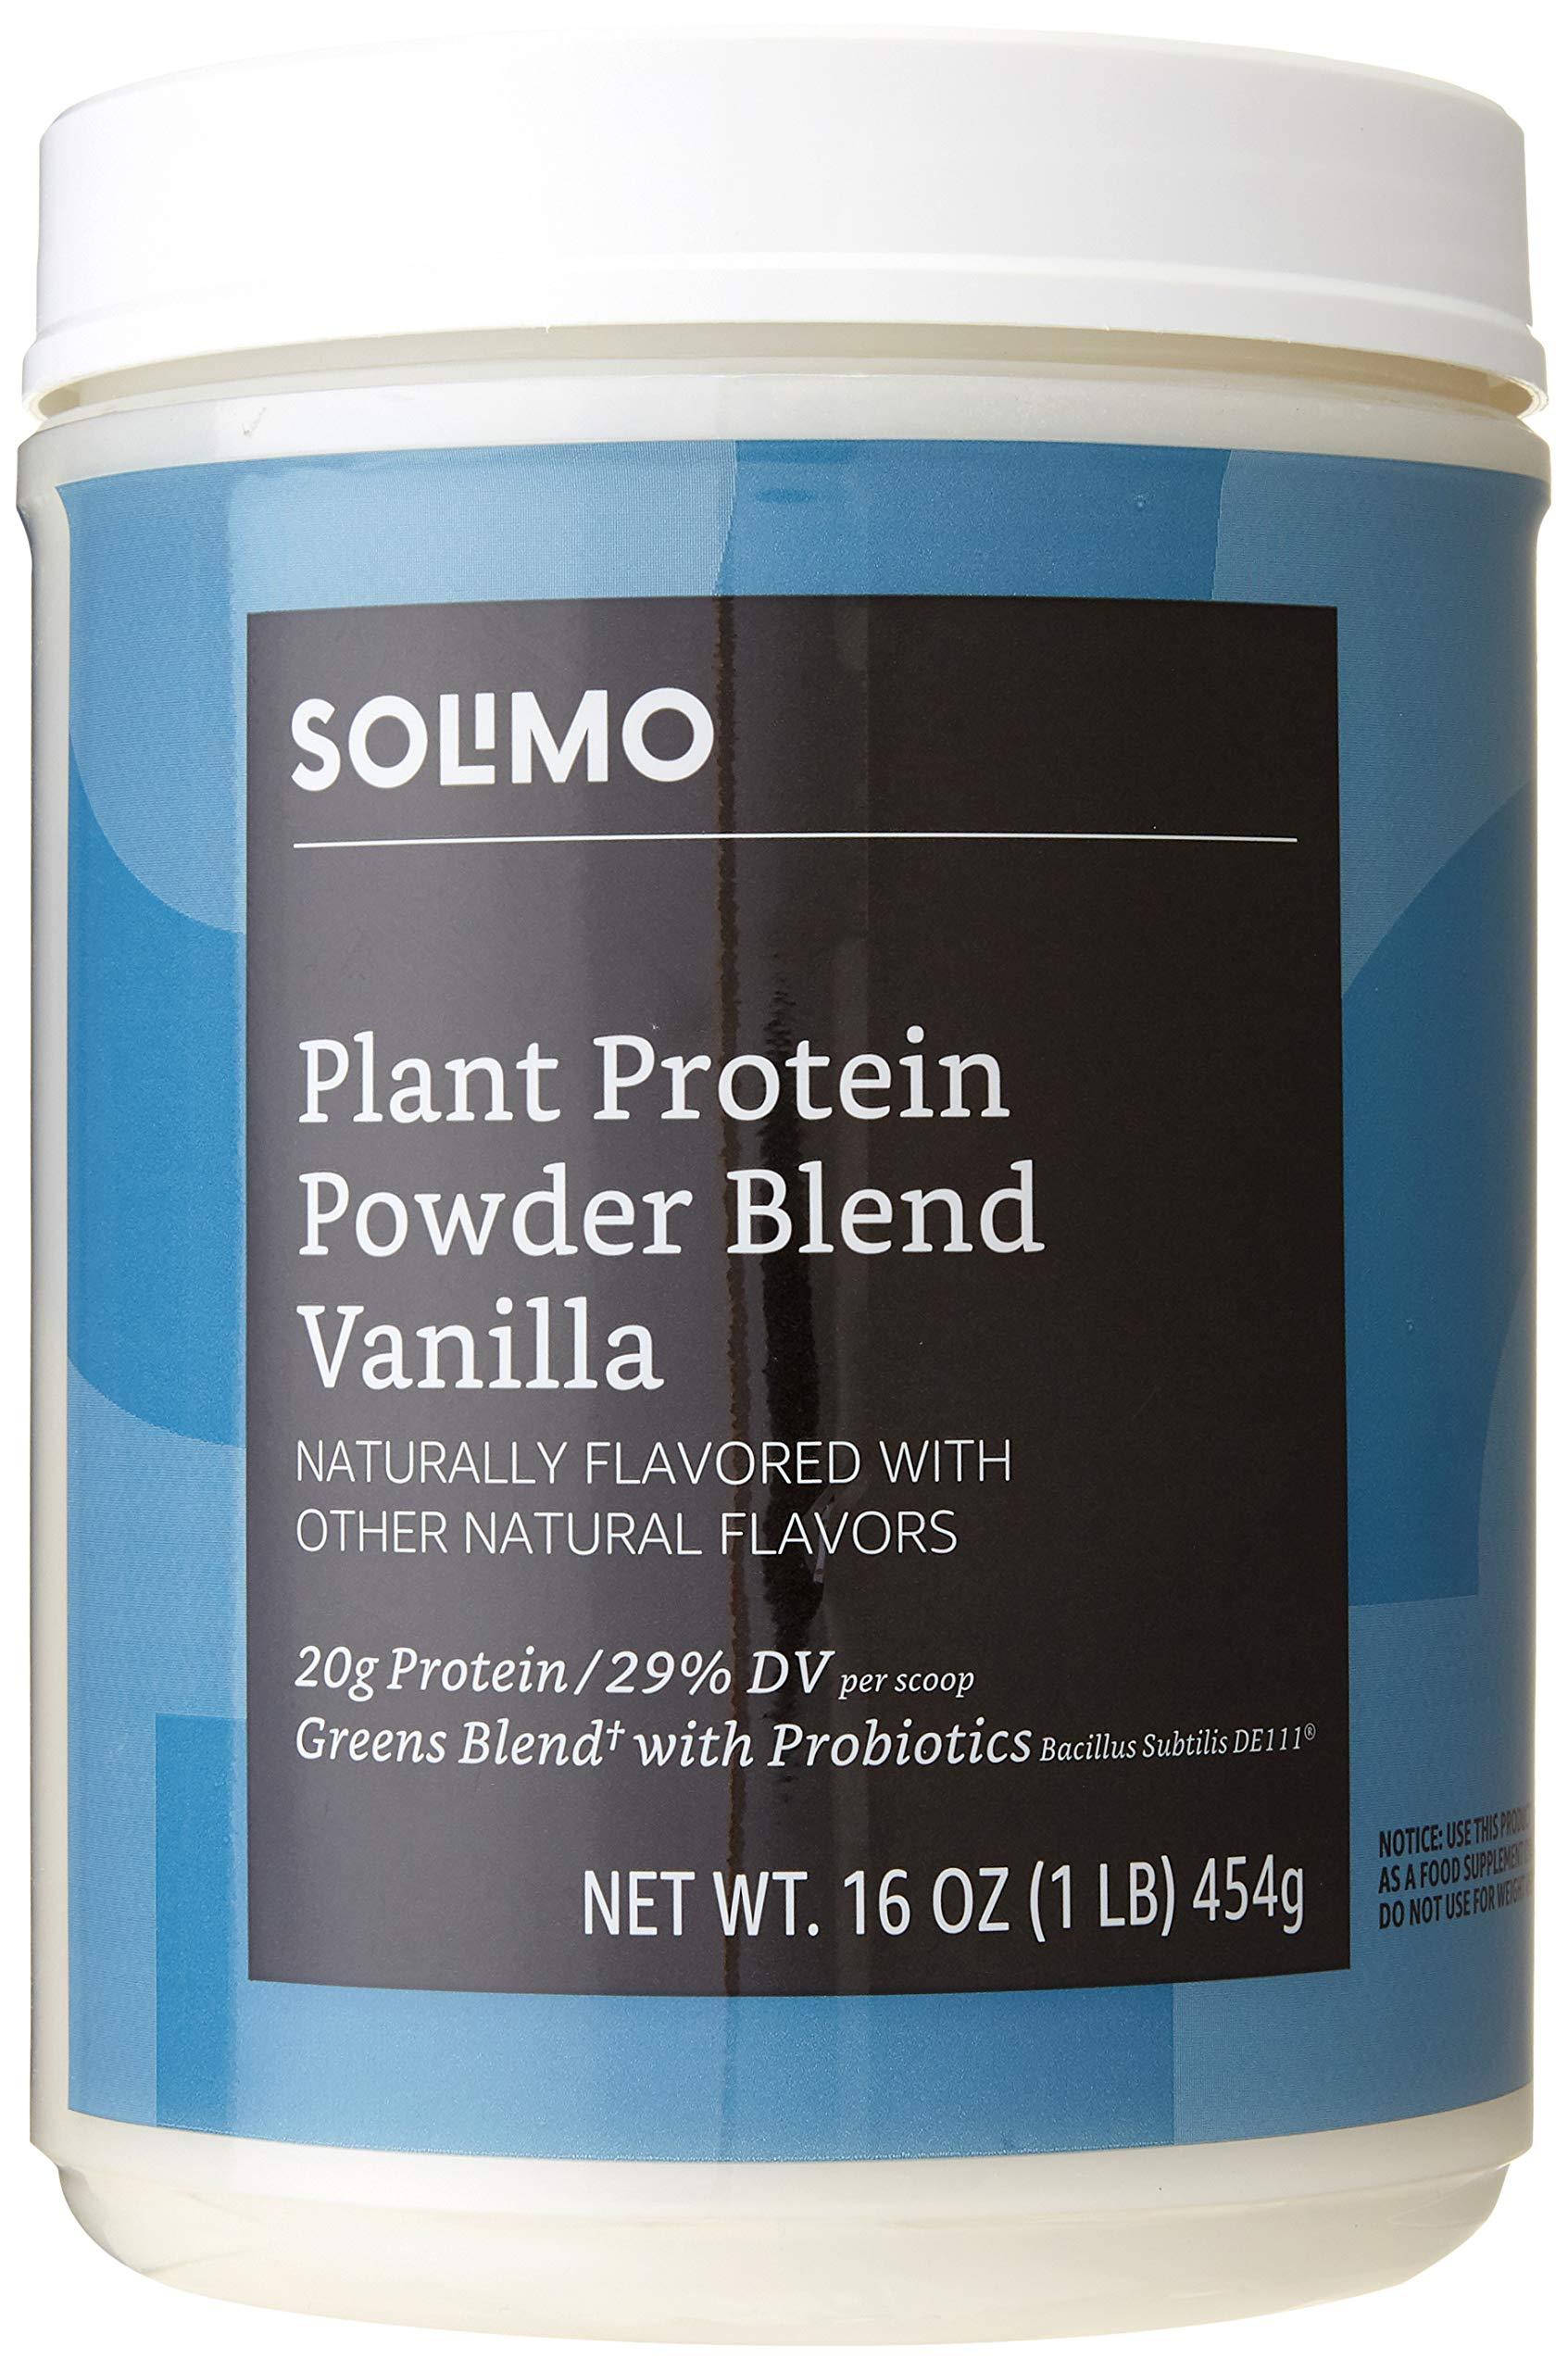 Amazon Brand - Solimo Plant Protein Powder Blend, Vanilla, 1 Pound, 13 Servings